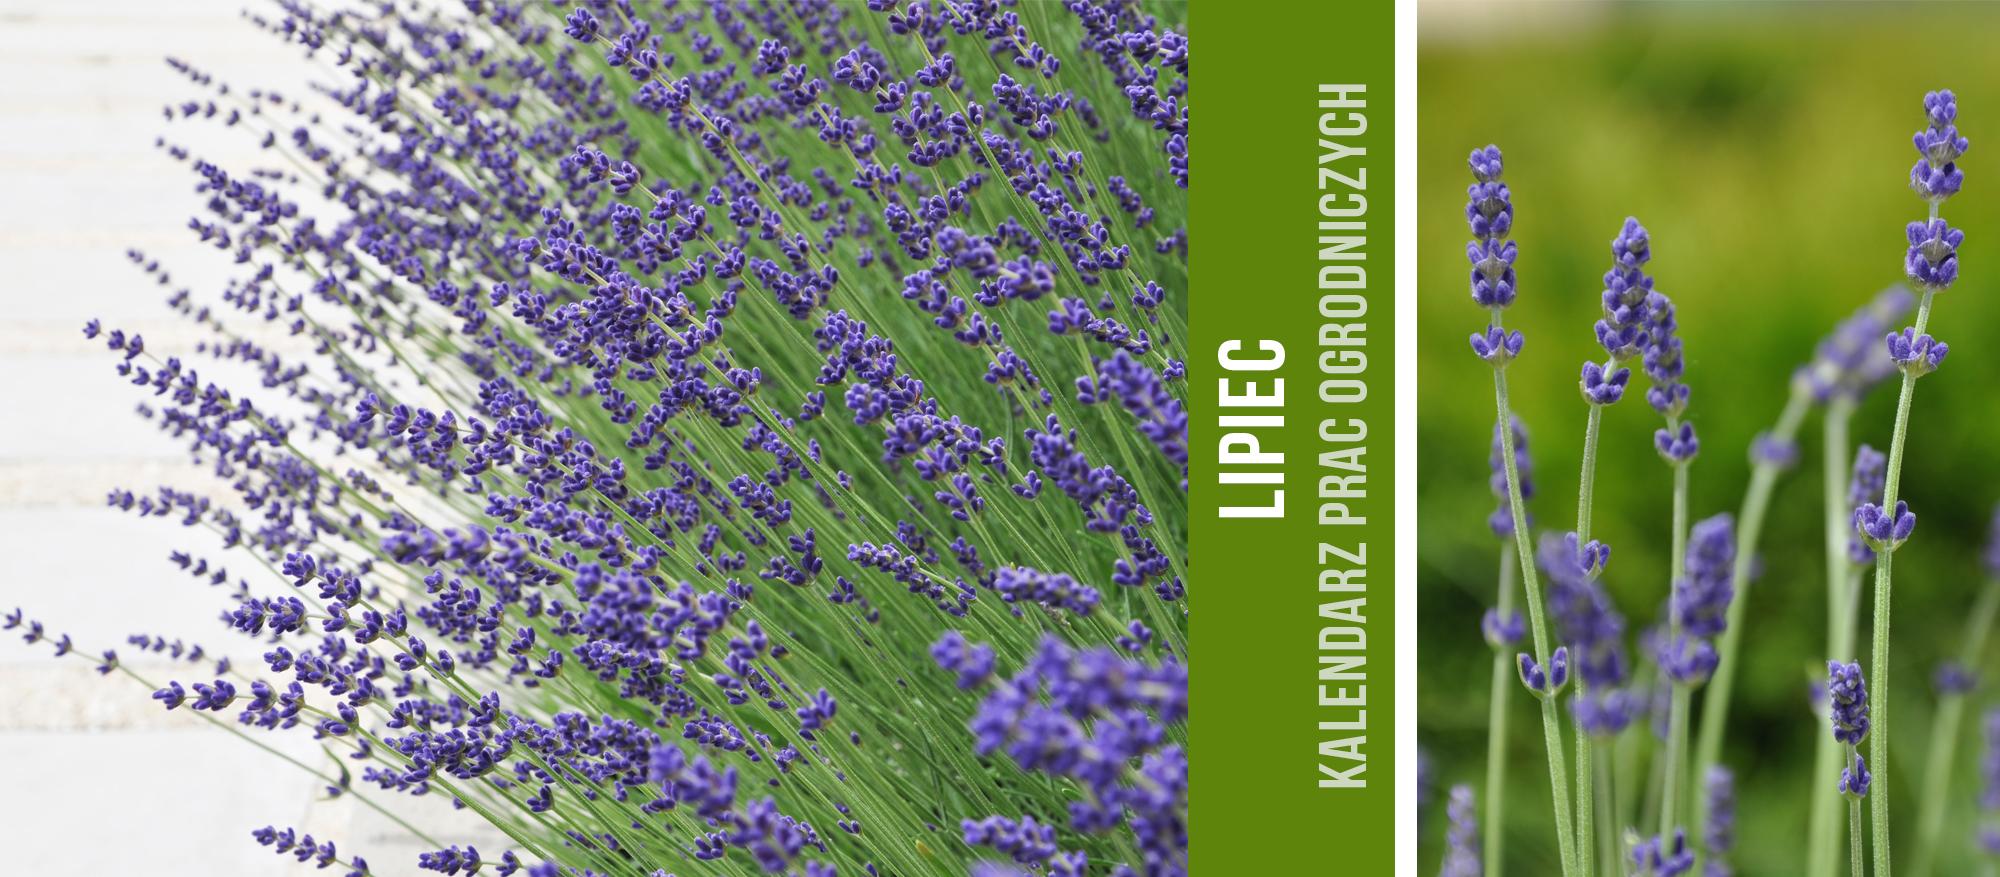 Green-Design-Blog_lipiec_cover_photo_2